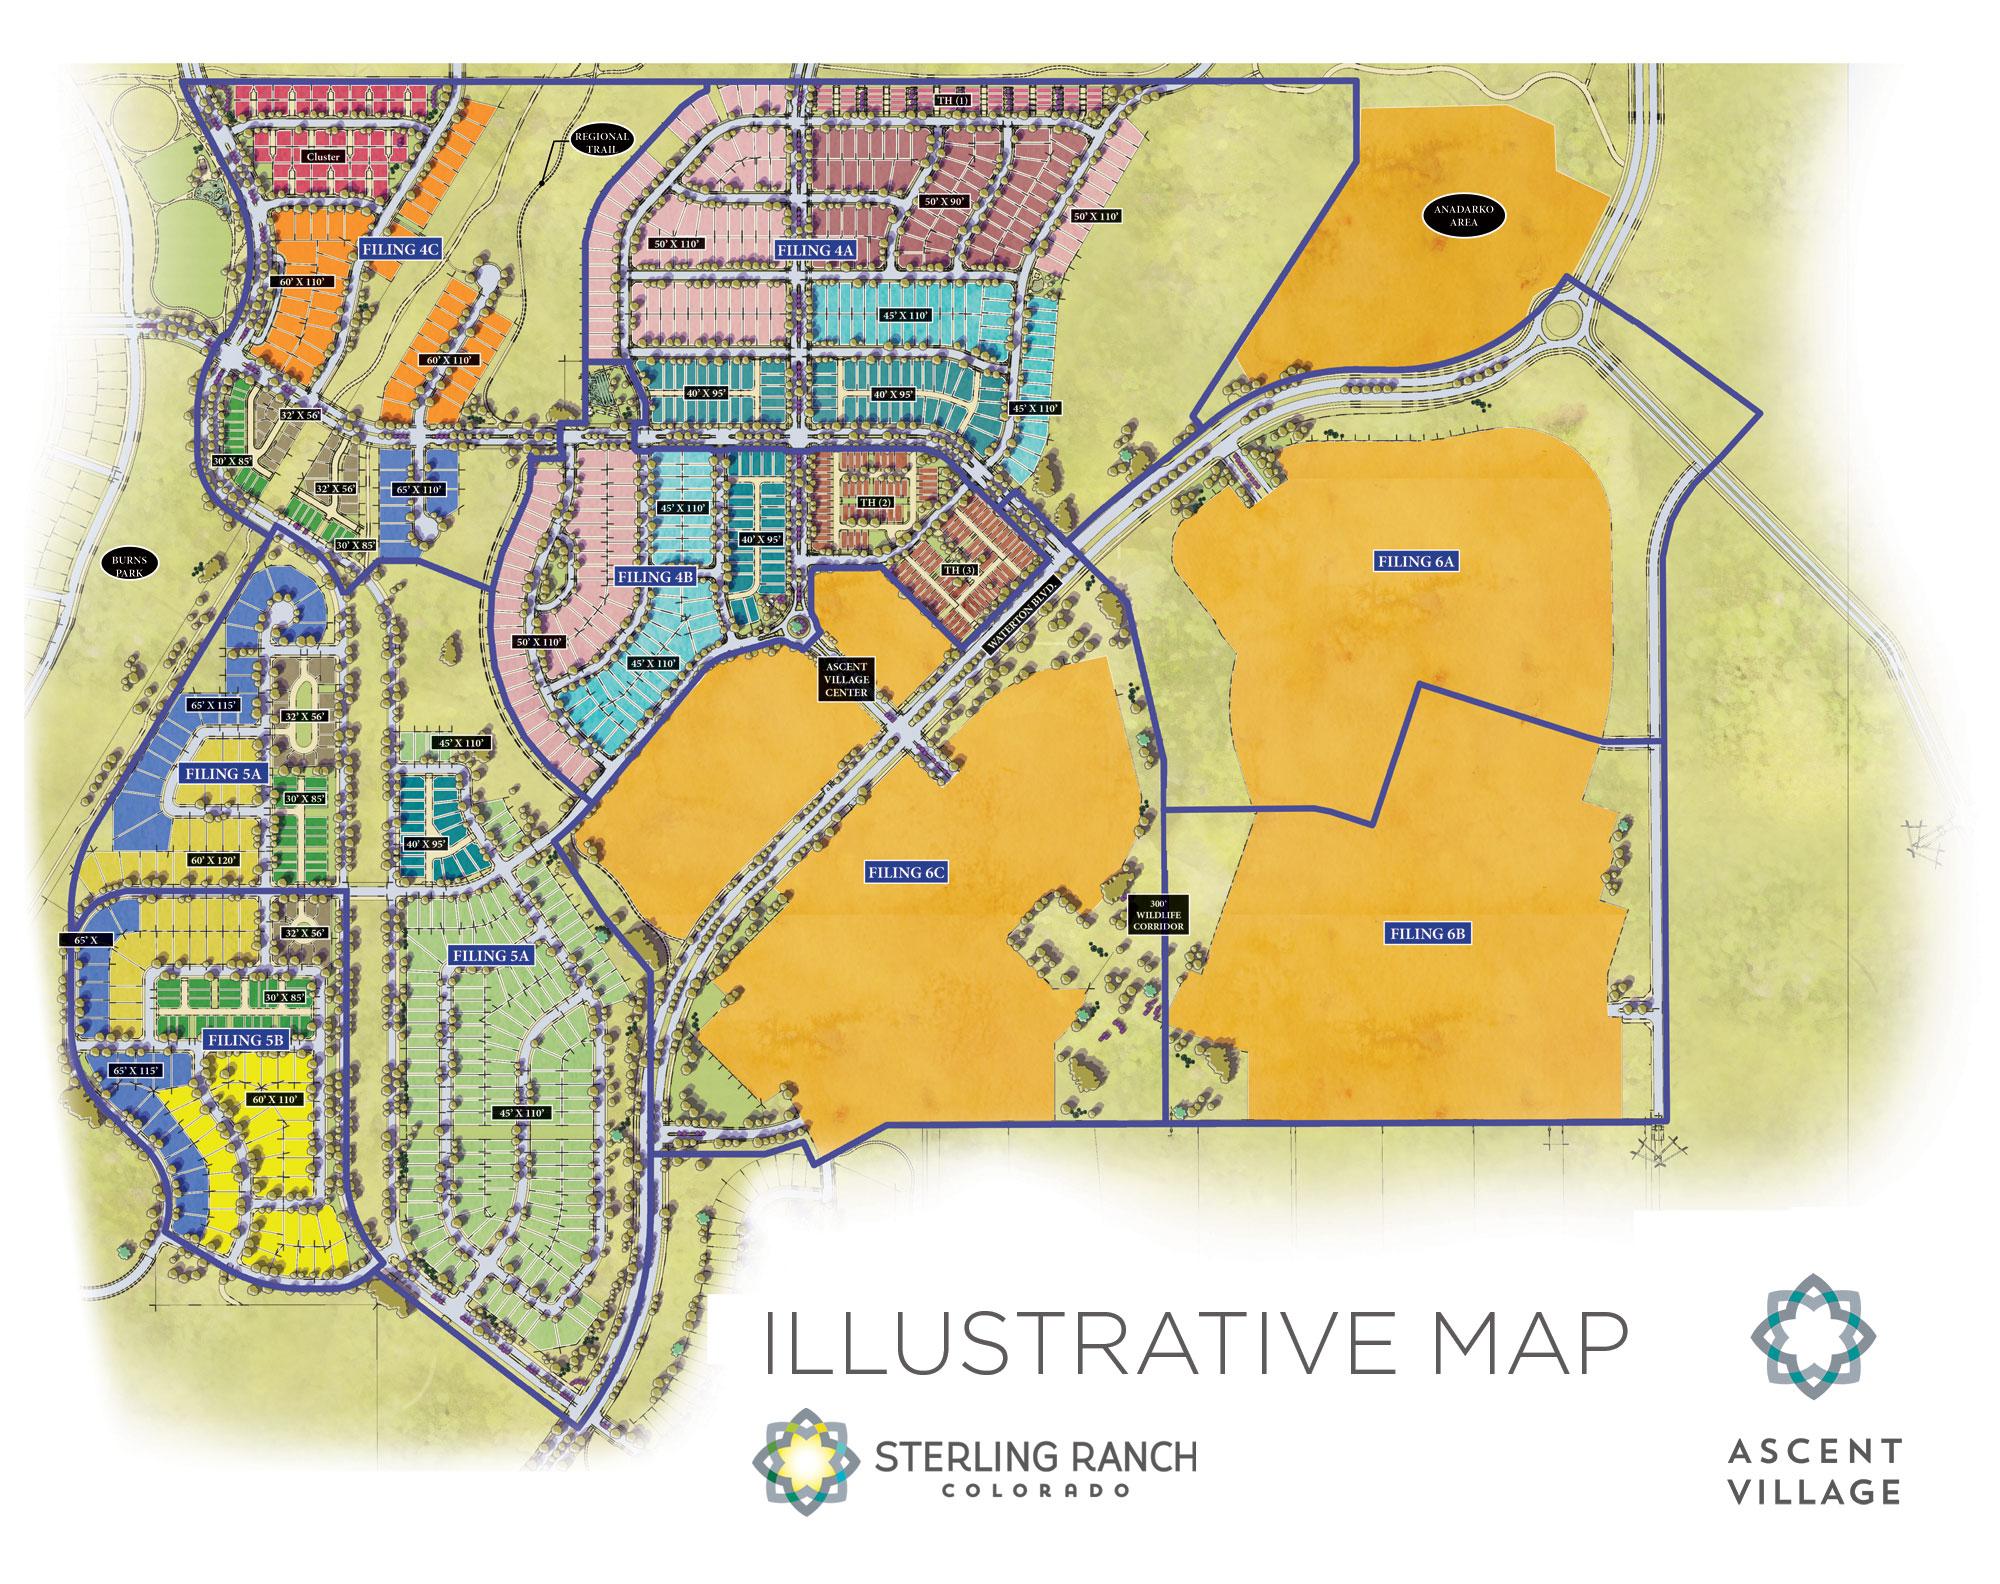 Ascent-Village-Illustrative-Map-9.26.19